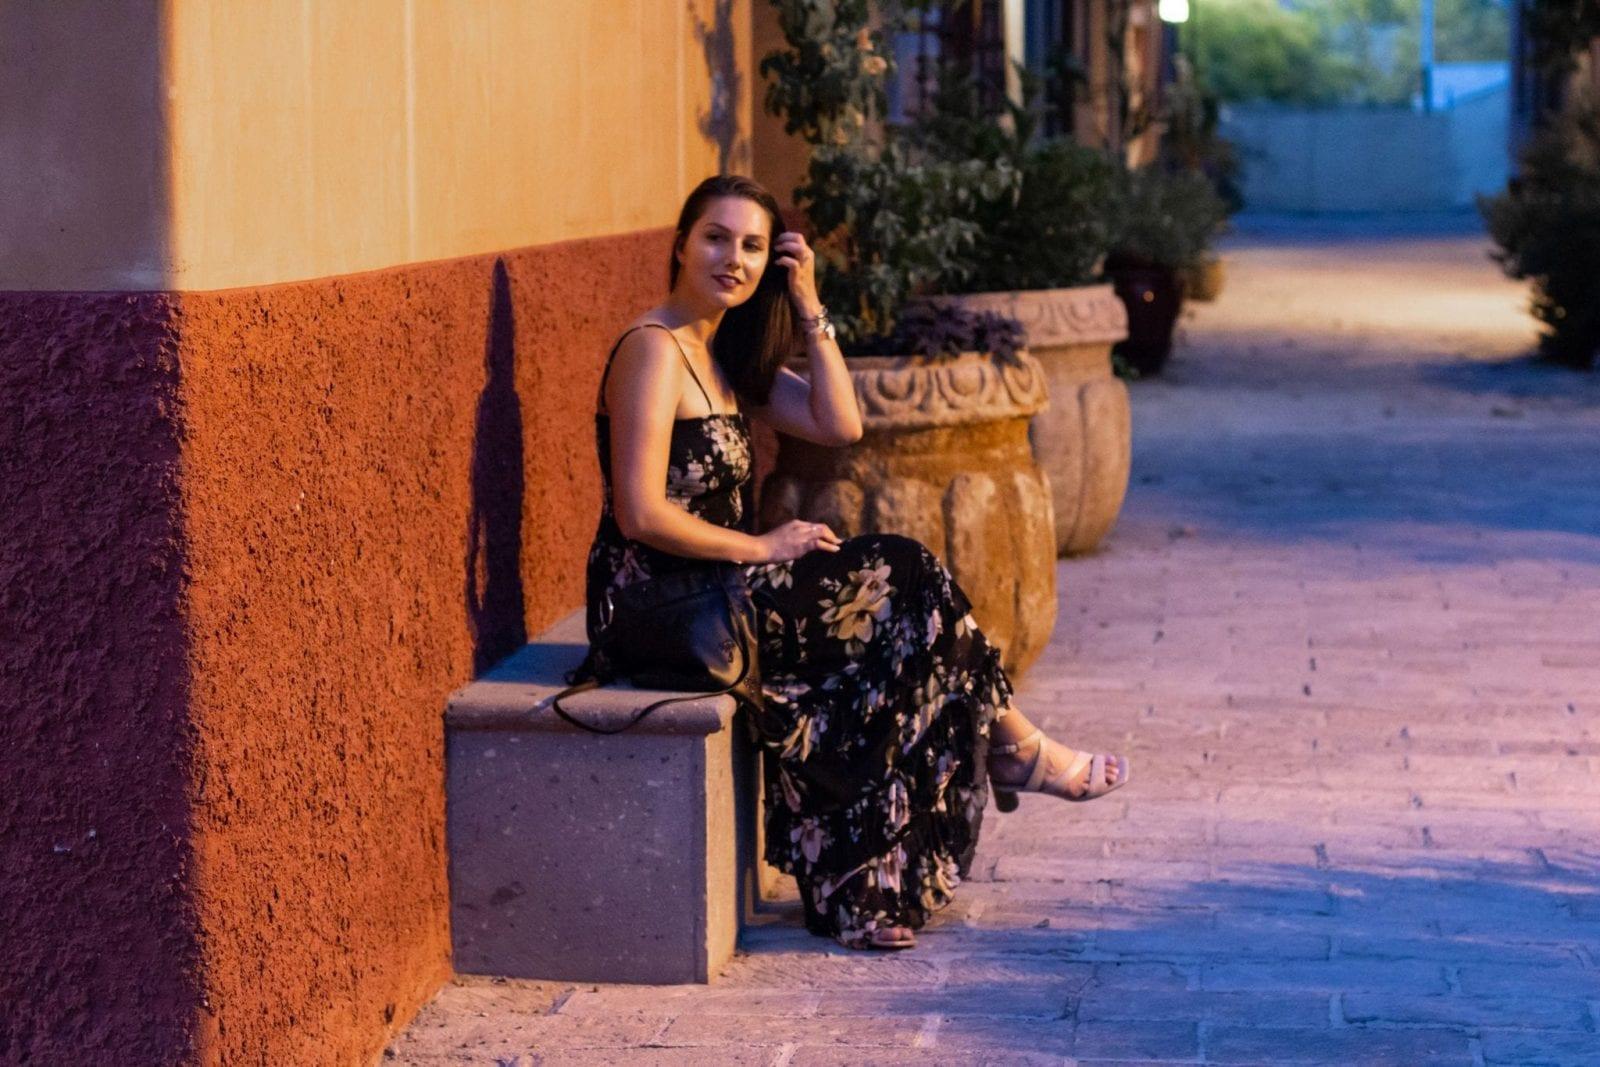 Sitting on a Bench in San Mercado Agustin in Tucson Arizona.